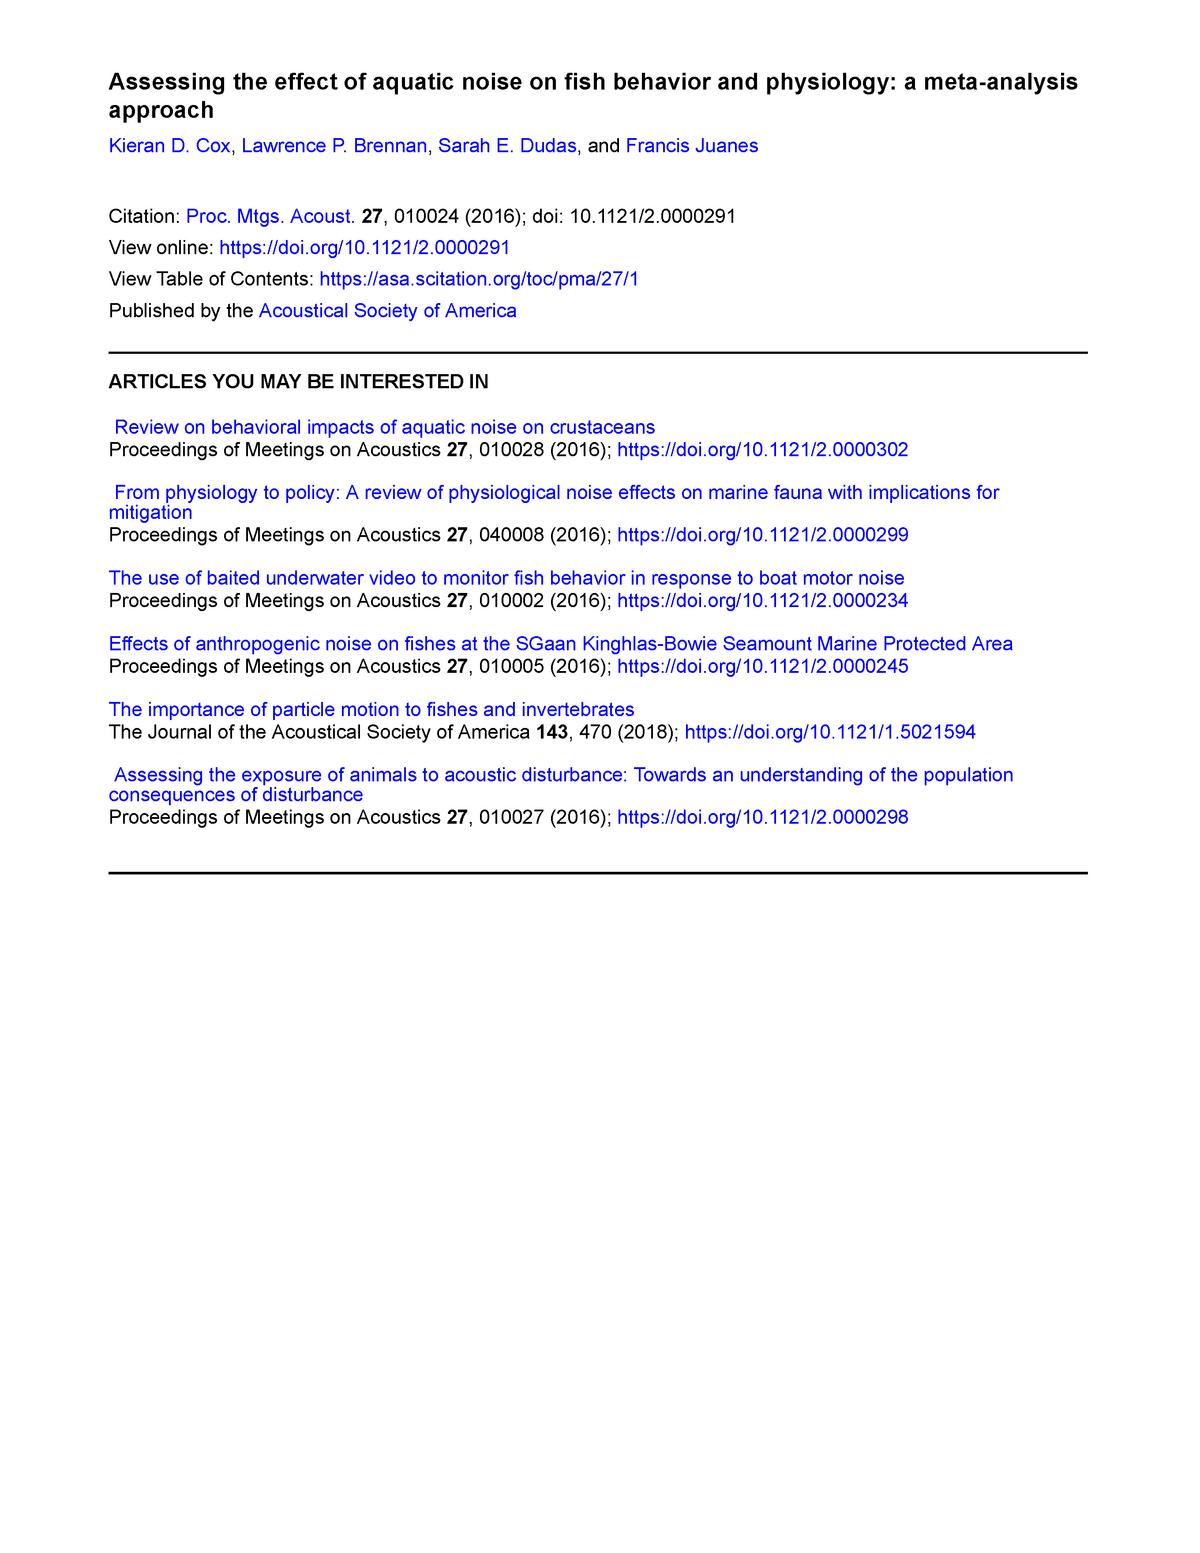 2 - yea - Bio 107 Cell Biology LAB - UAlberta Assessing ...